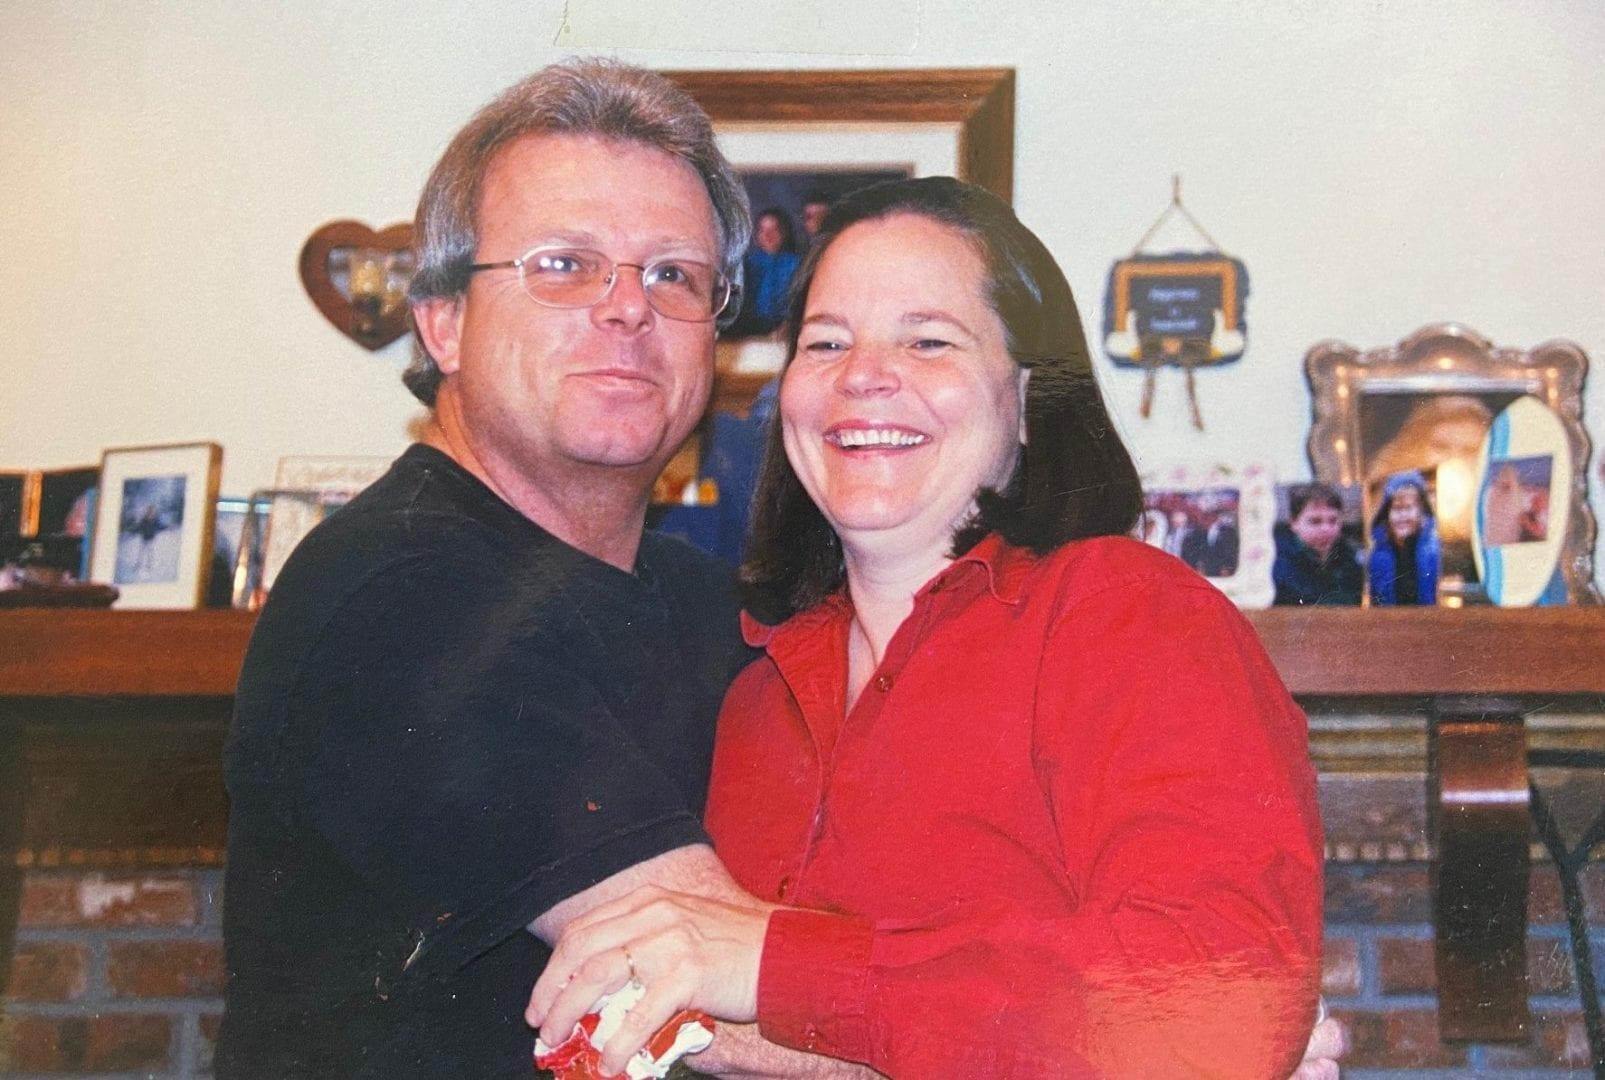 Jamie's Mom and Dad Hugging at Christmas - Happier Holidays at Home